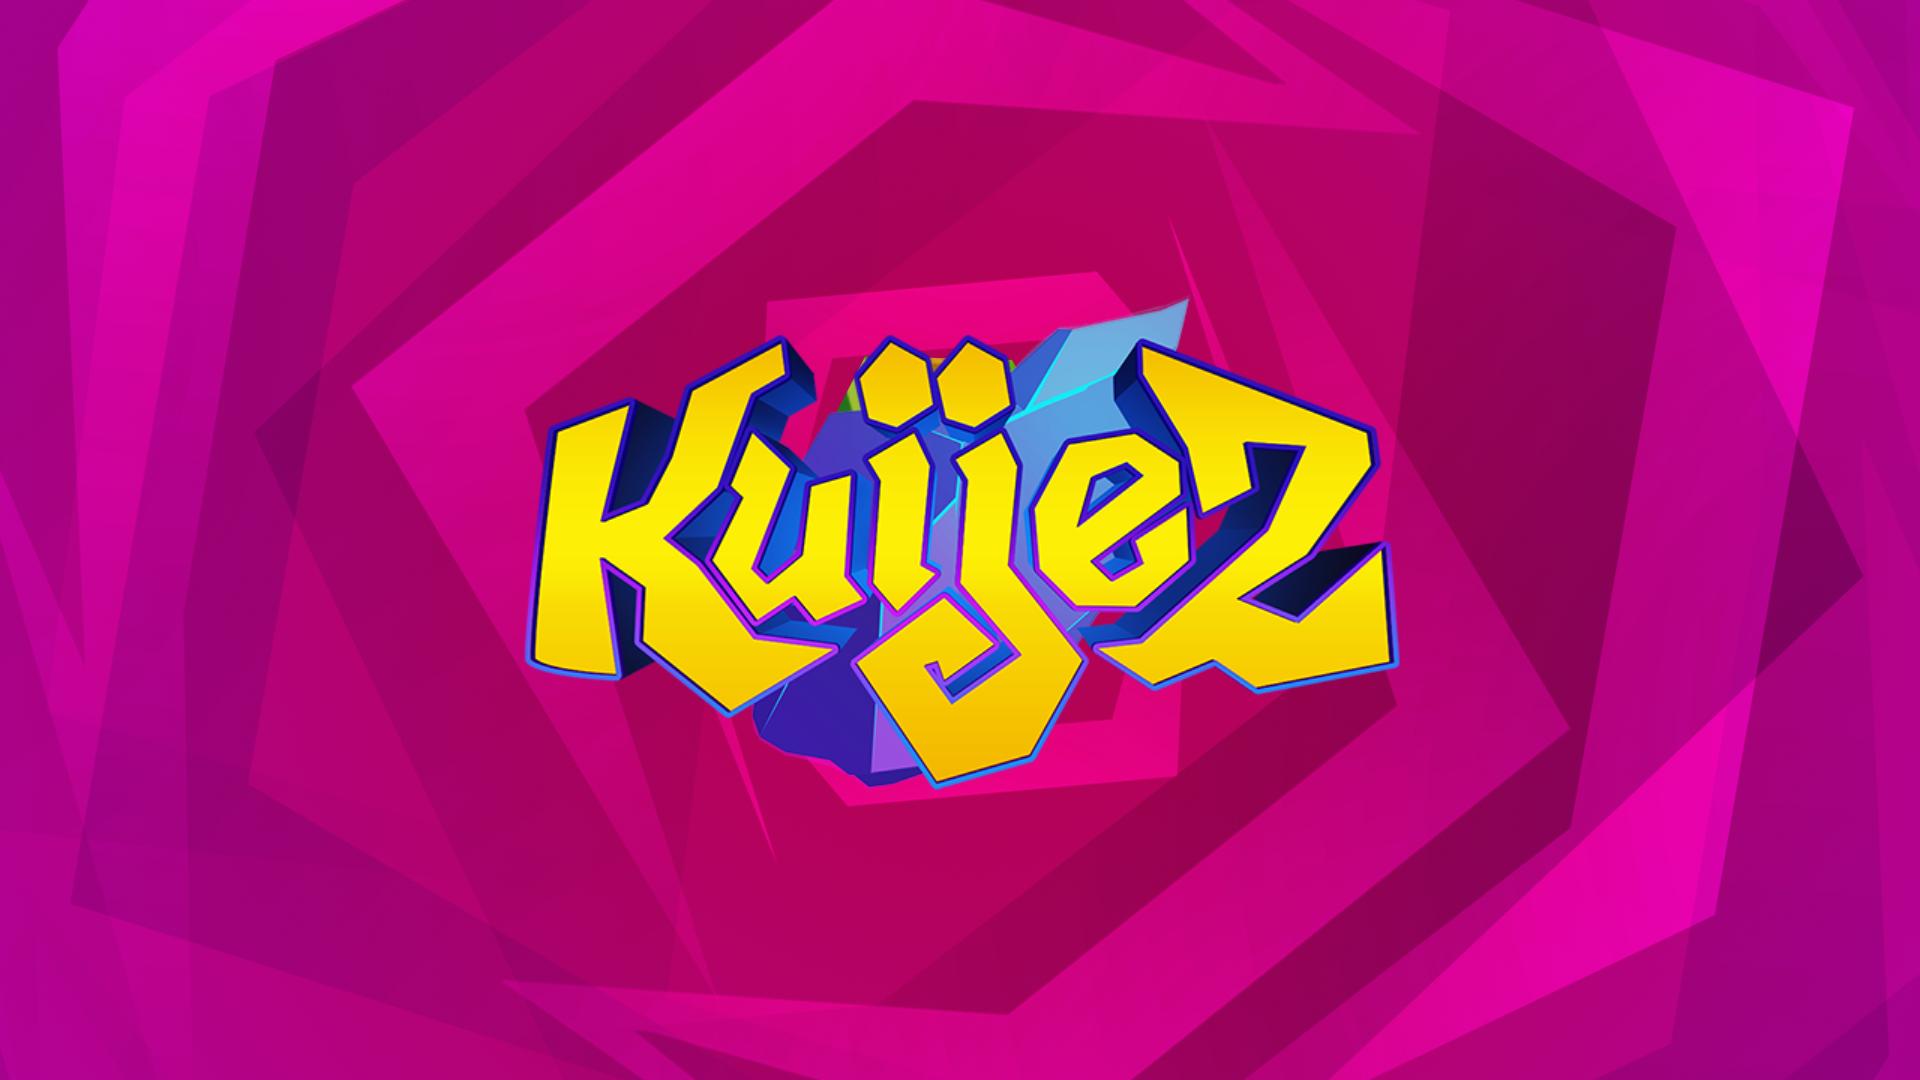 Kuijez